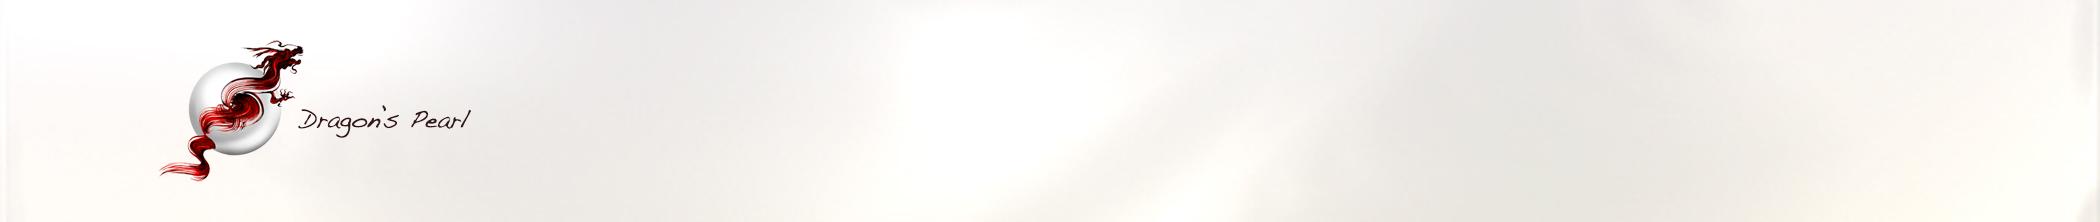 Dragon's Pearl logo for header 3-14-20 v